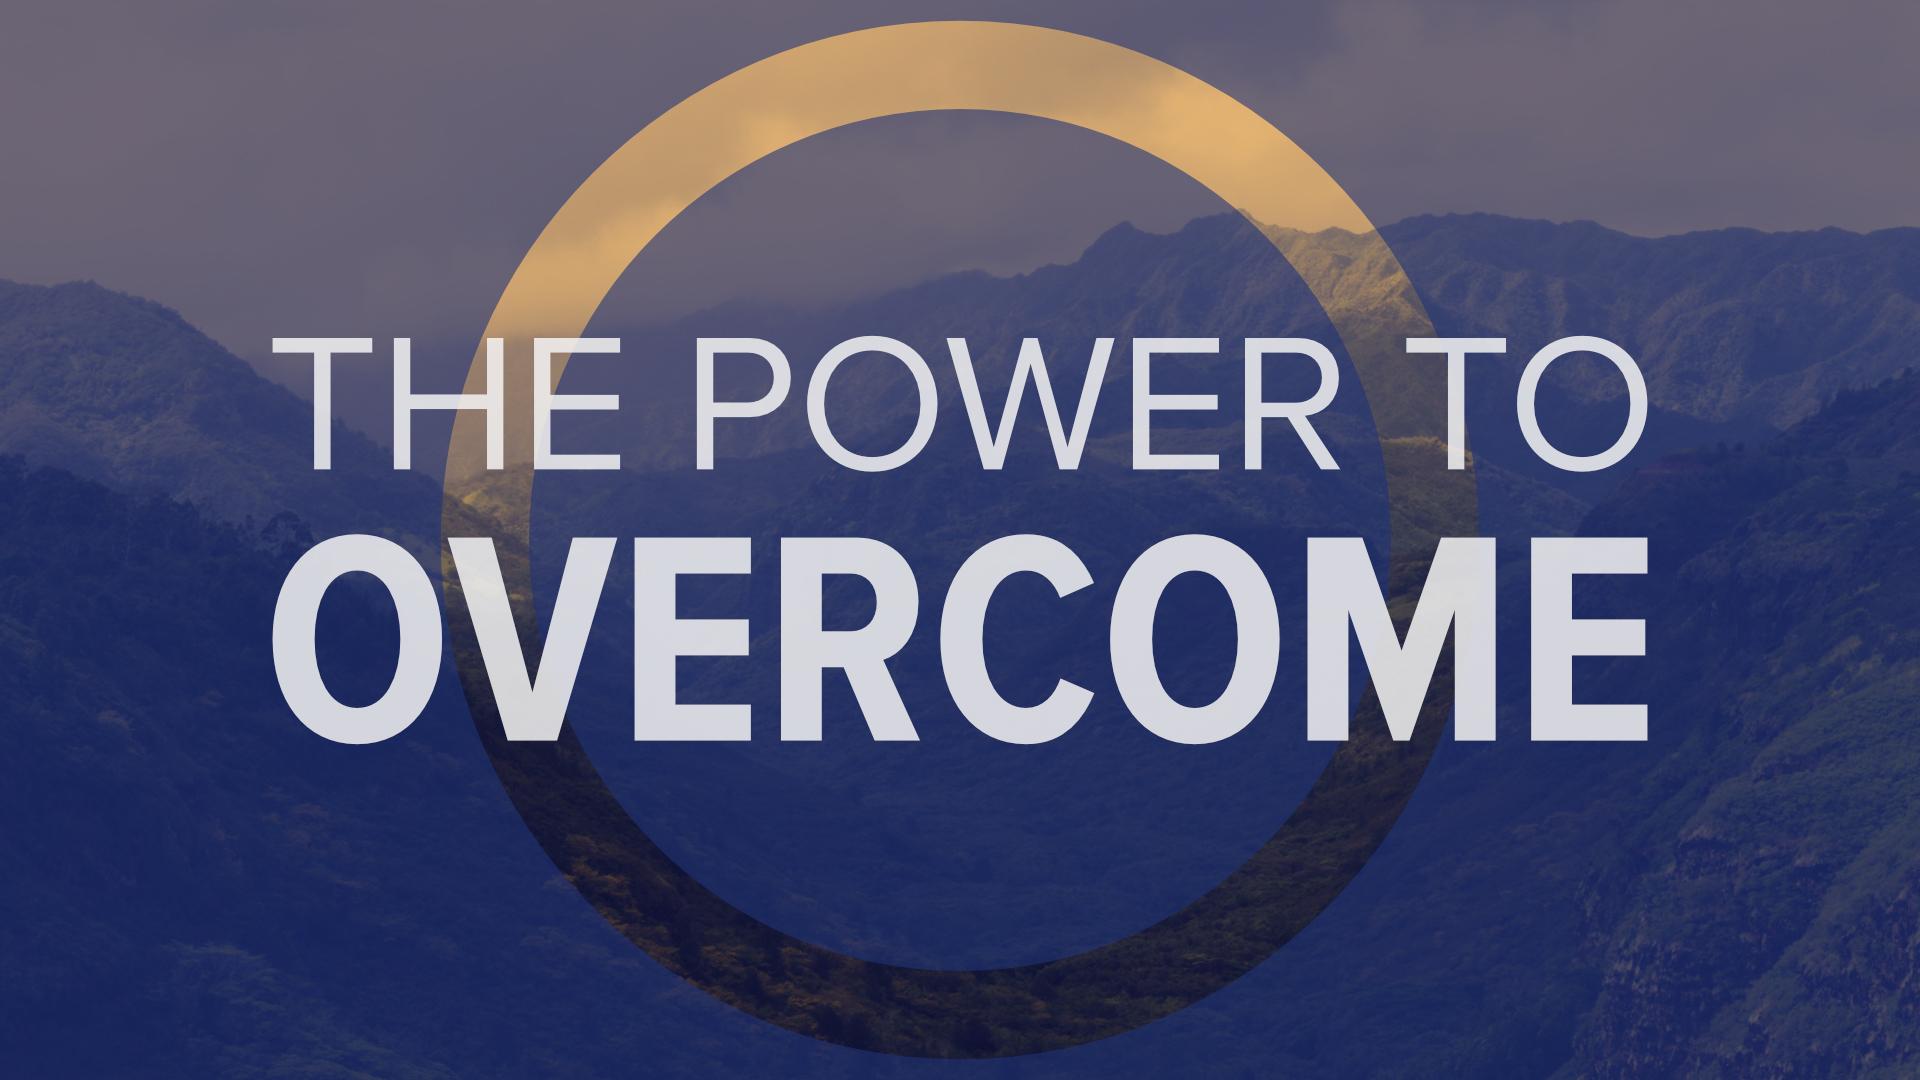 The Power to Overcome Sermon Graphic.jpg